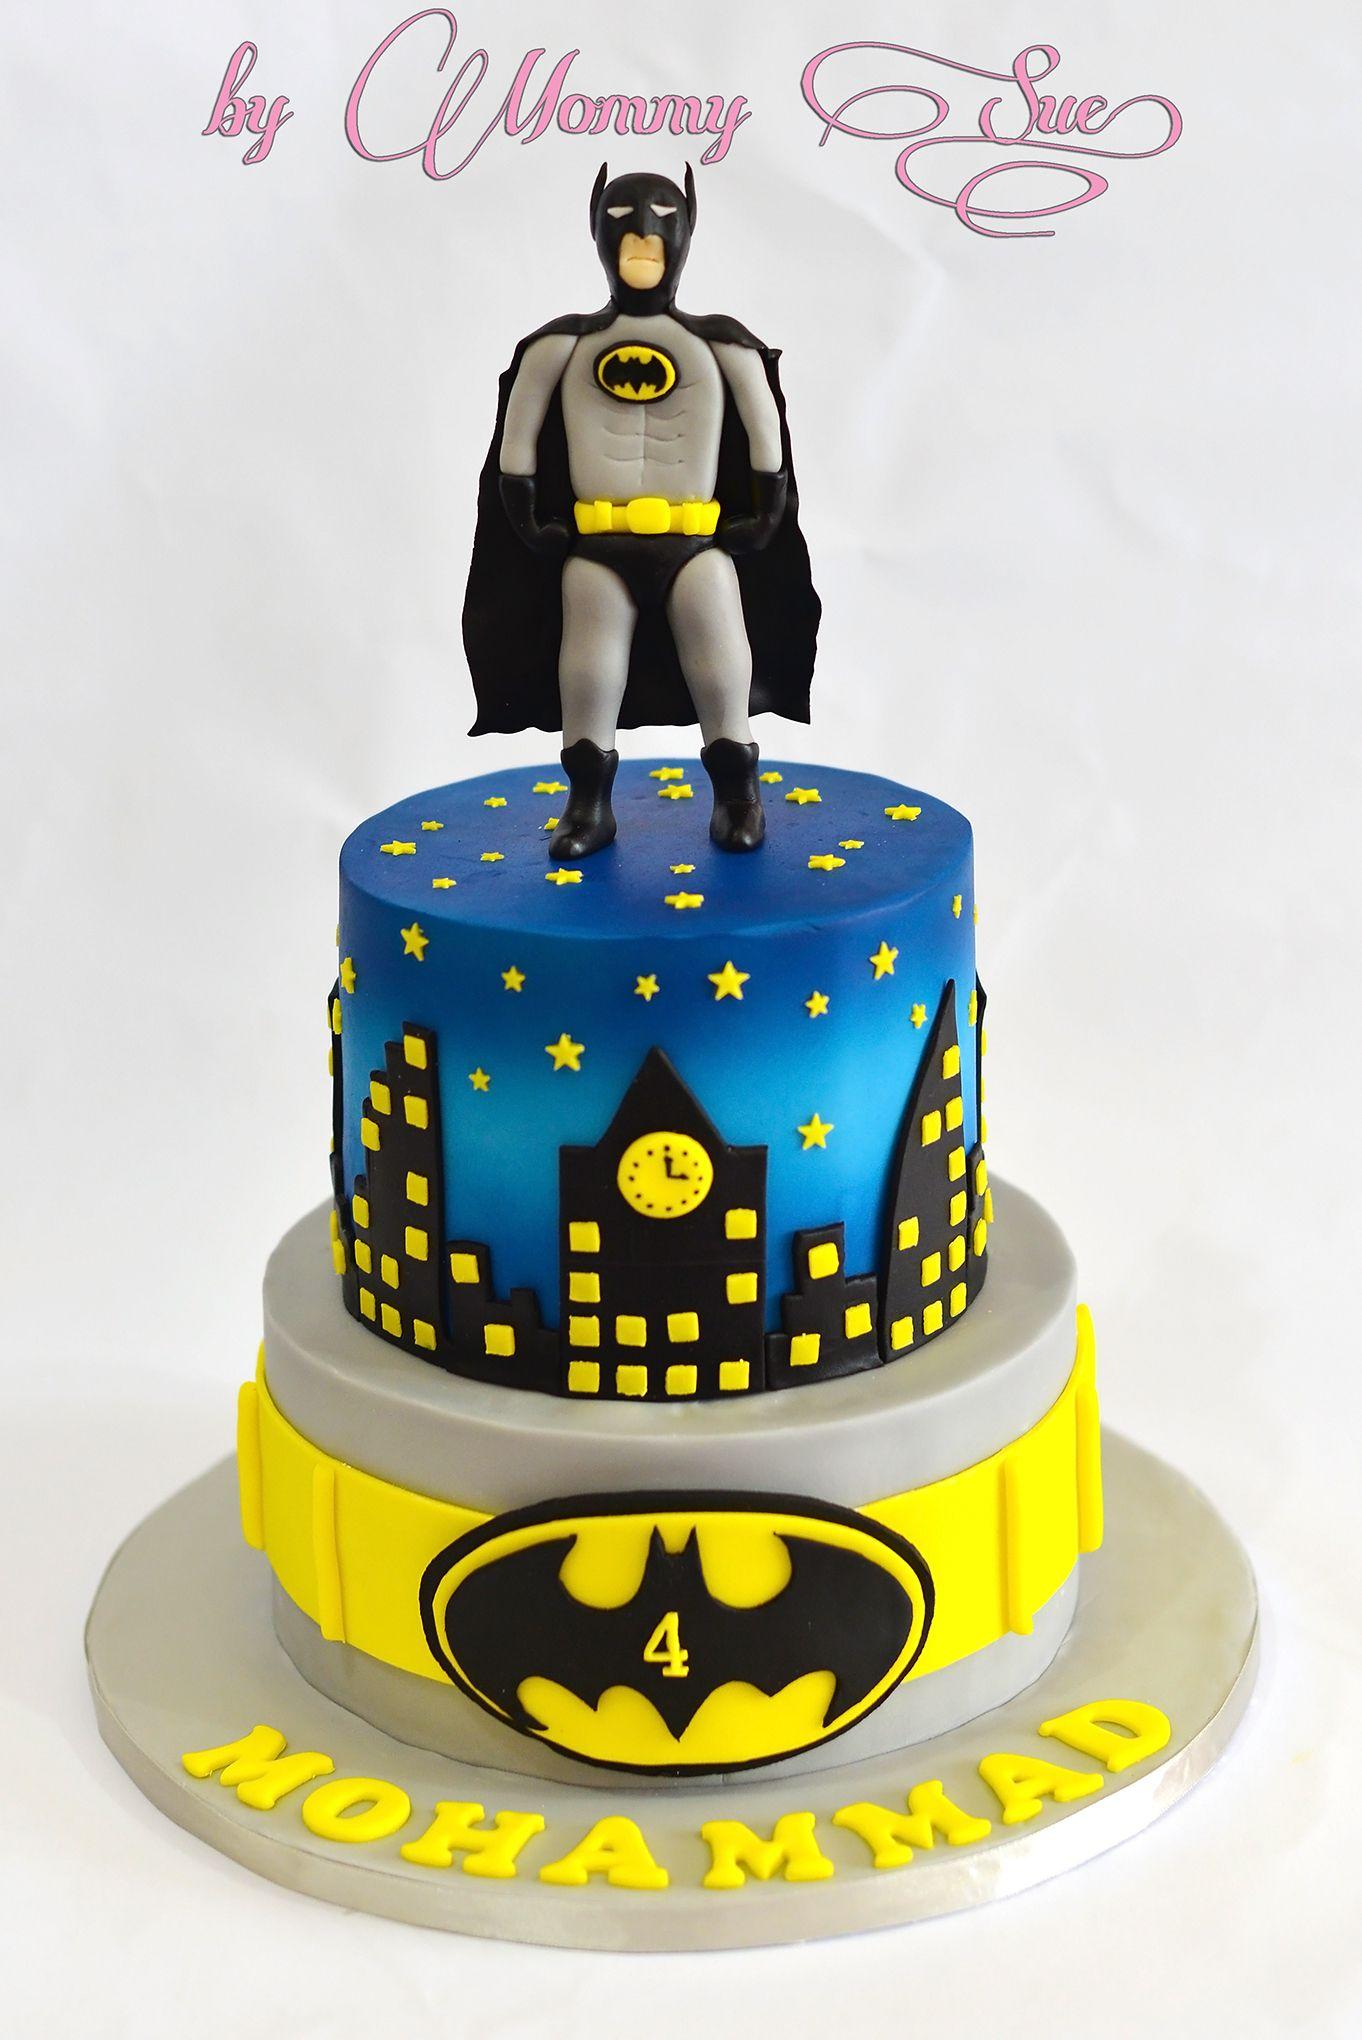 Batman Cake Birthday Cake for Boys Pinterest Batman cakes